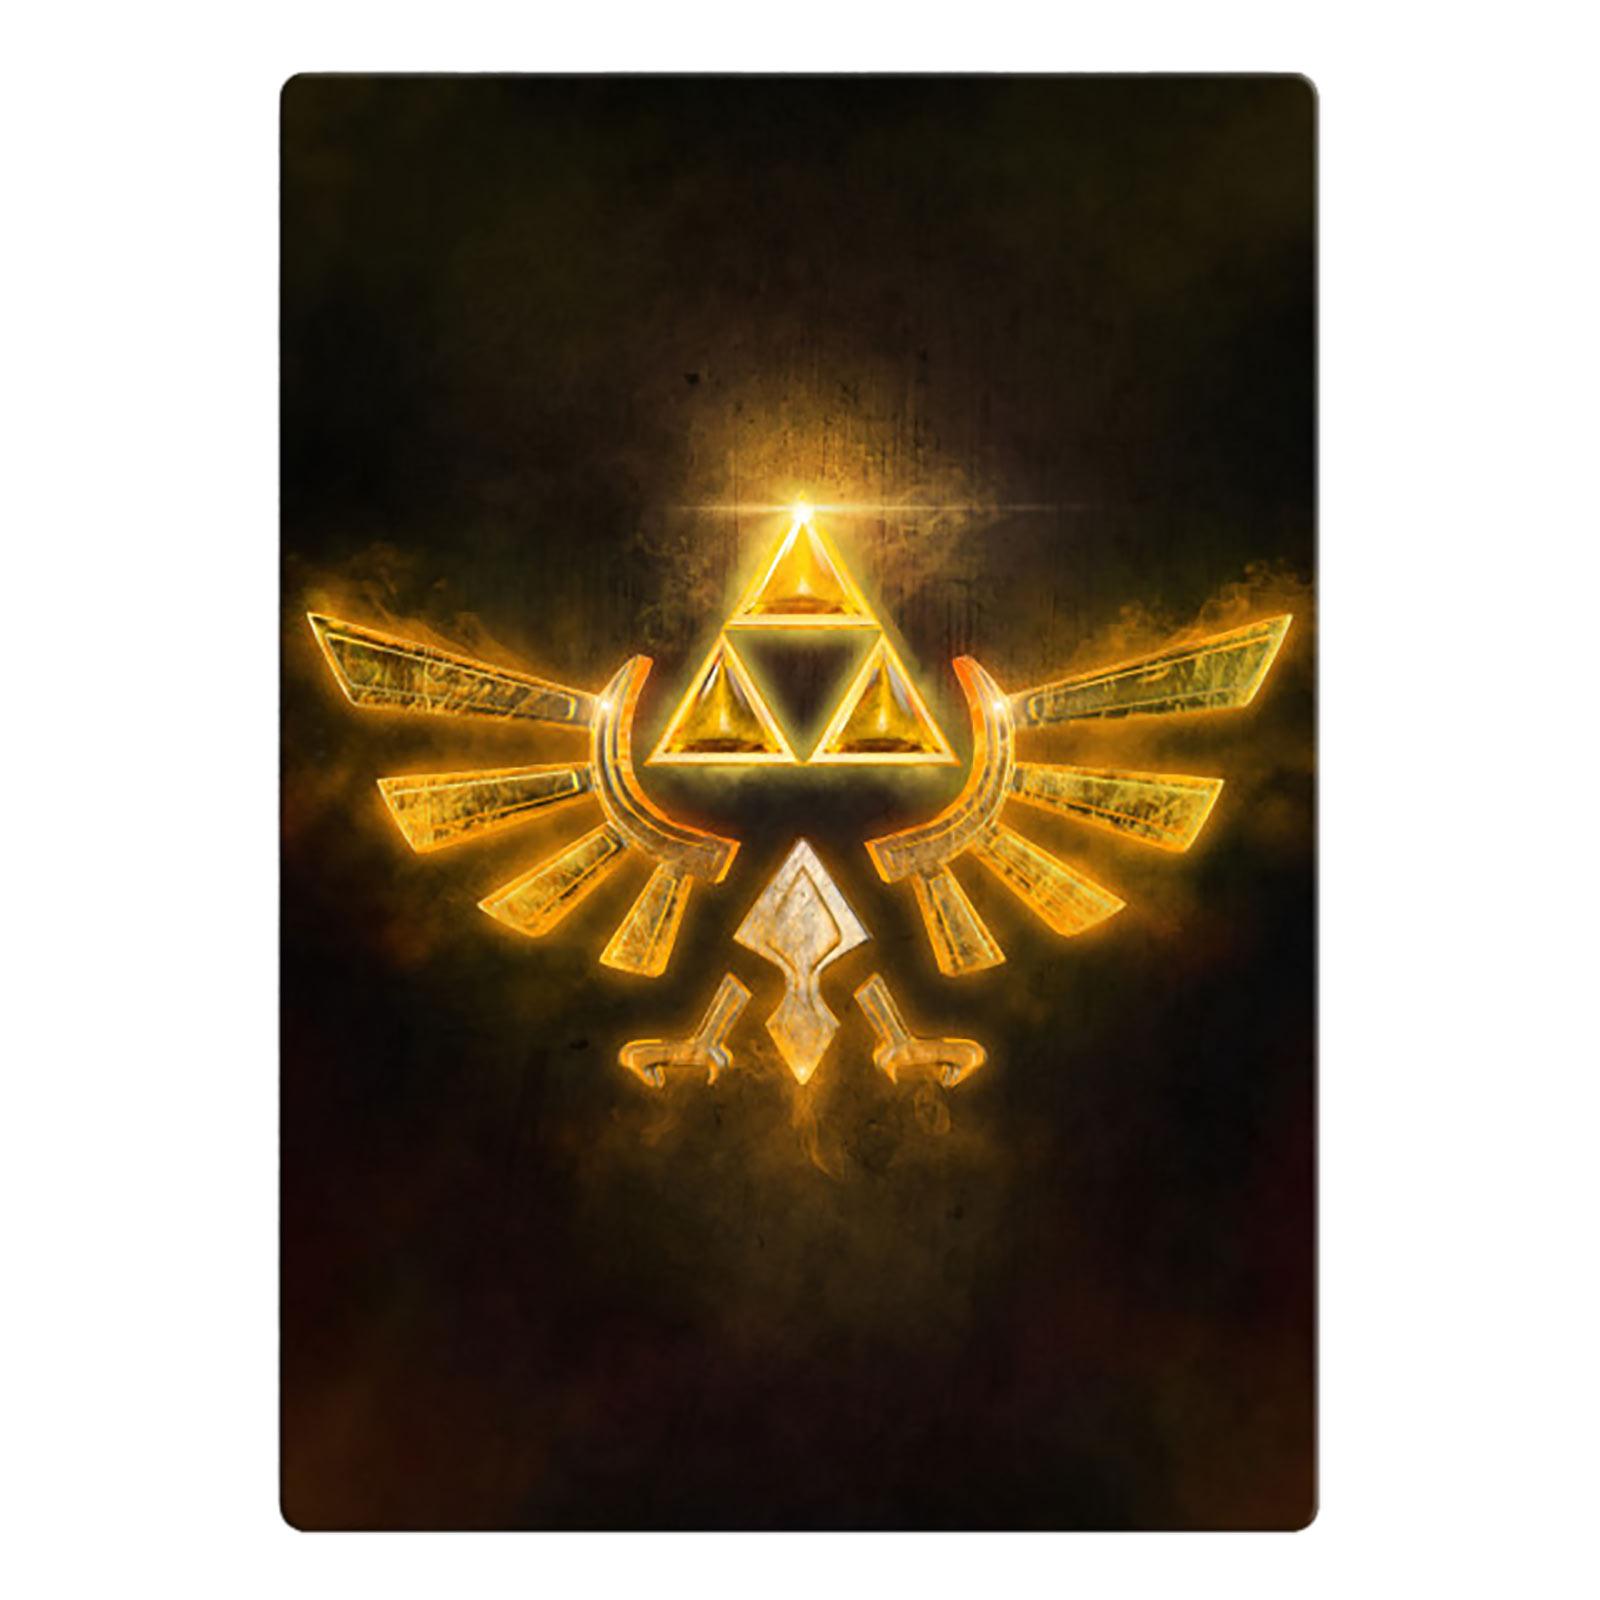 Hyrule Logo Metall Poster für Zelda Fans